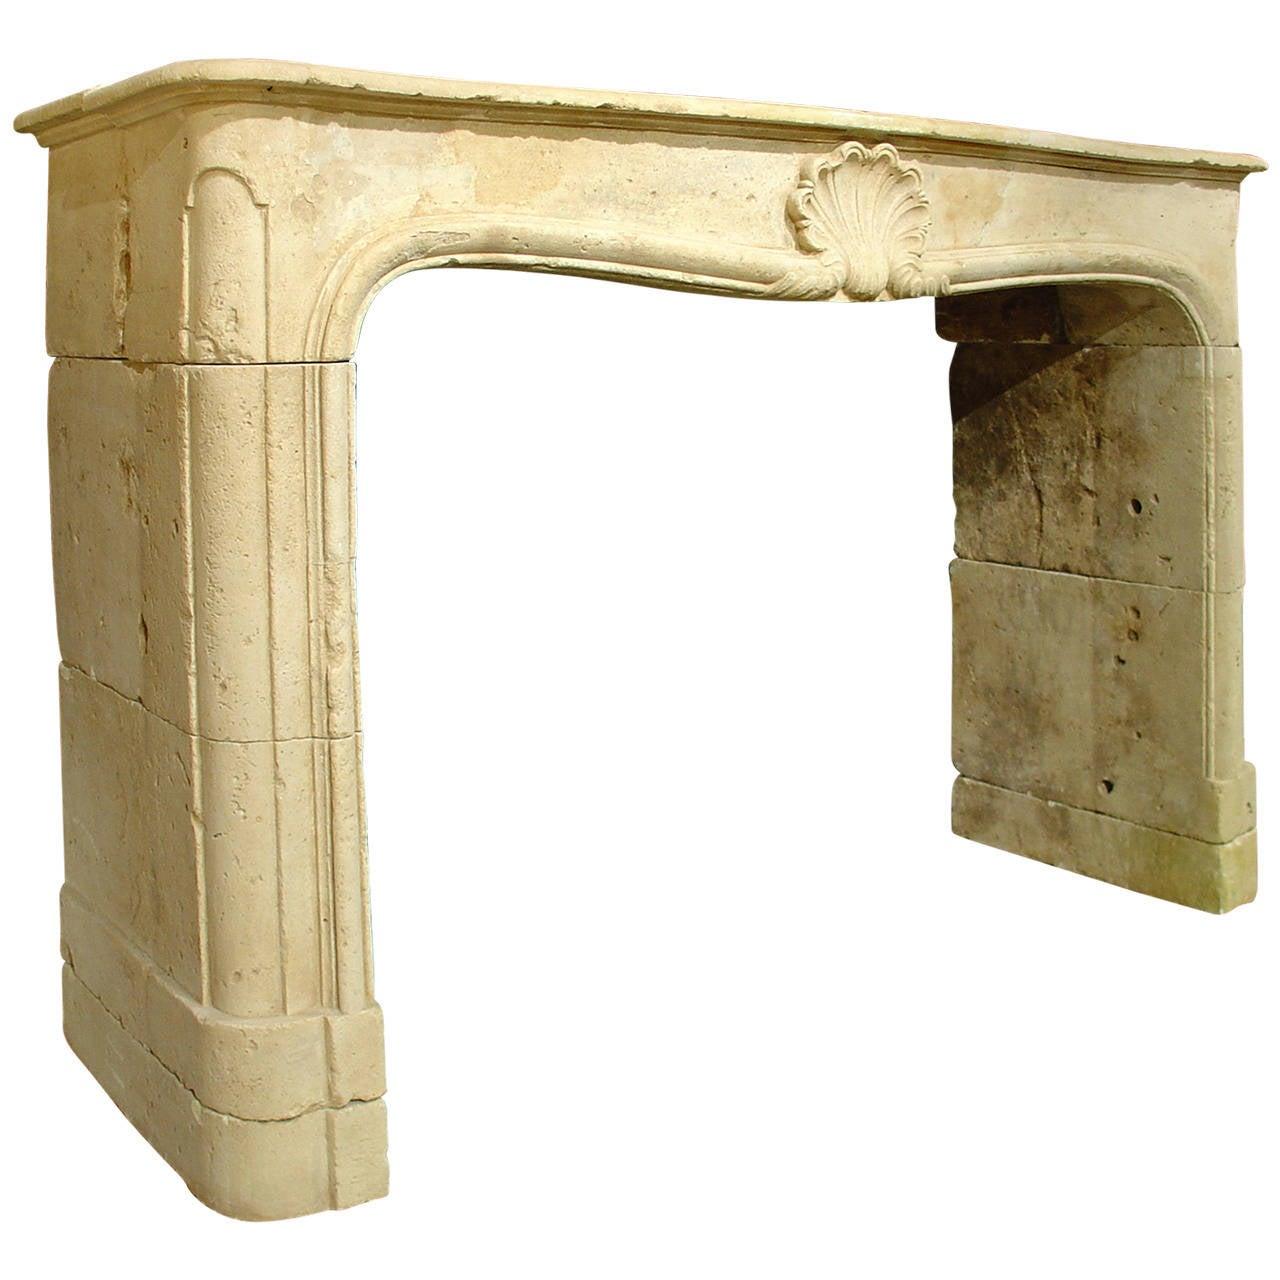 Period Louis XV Limestone Fireplace Mantel At 1stdibs